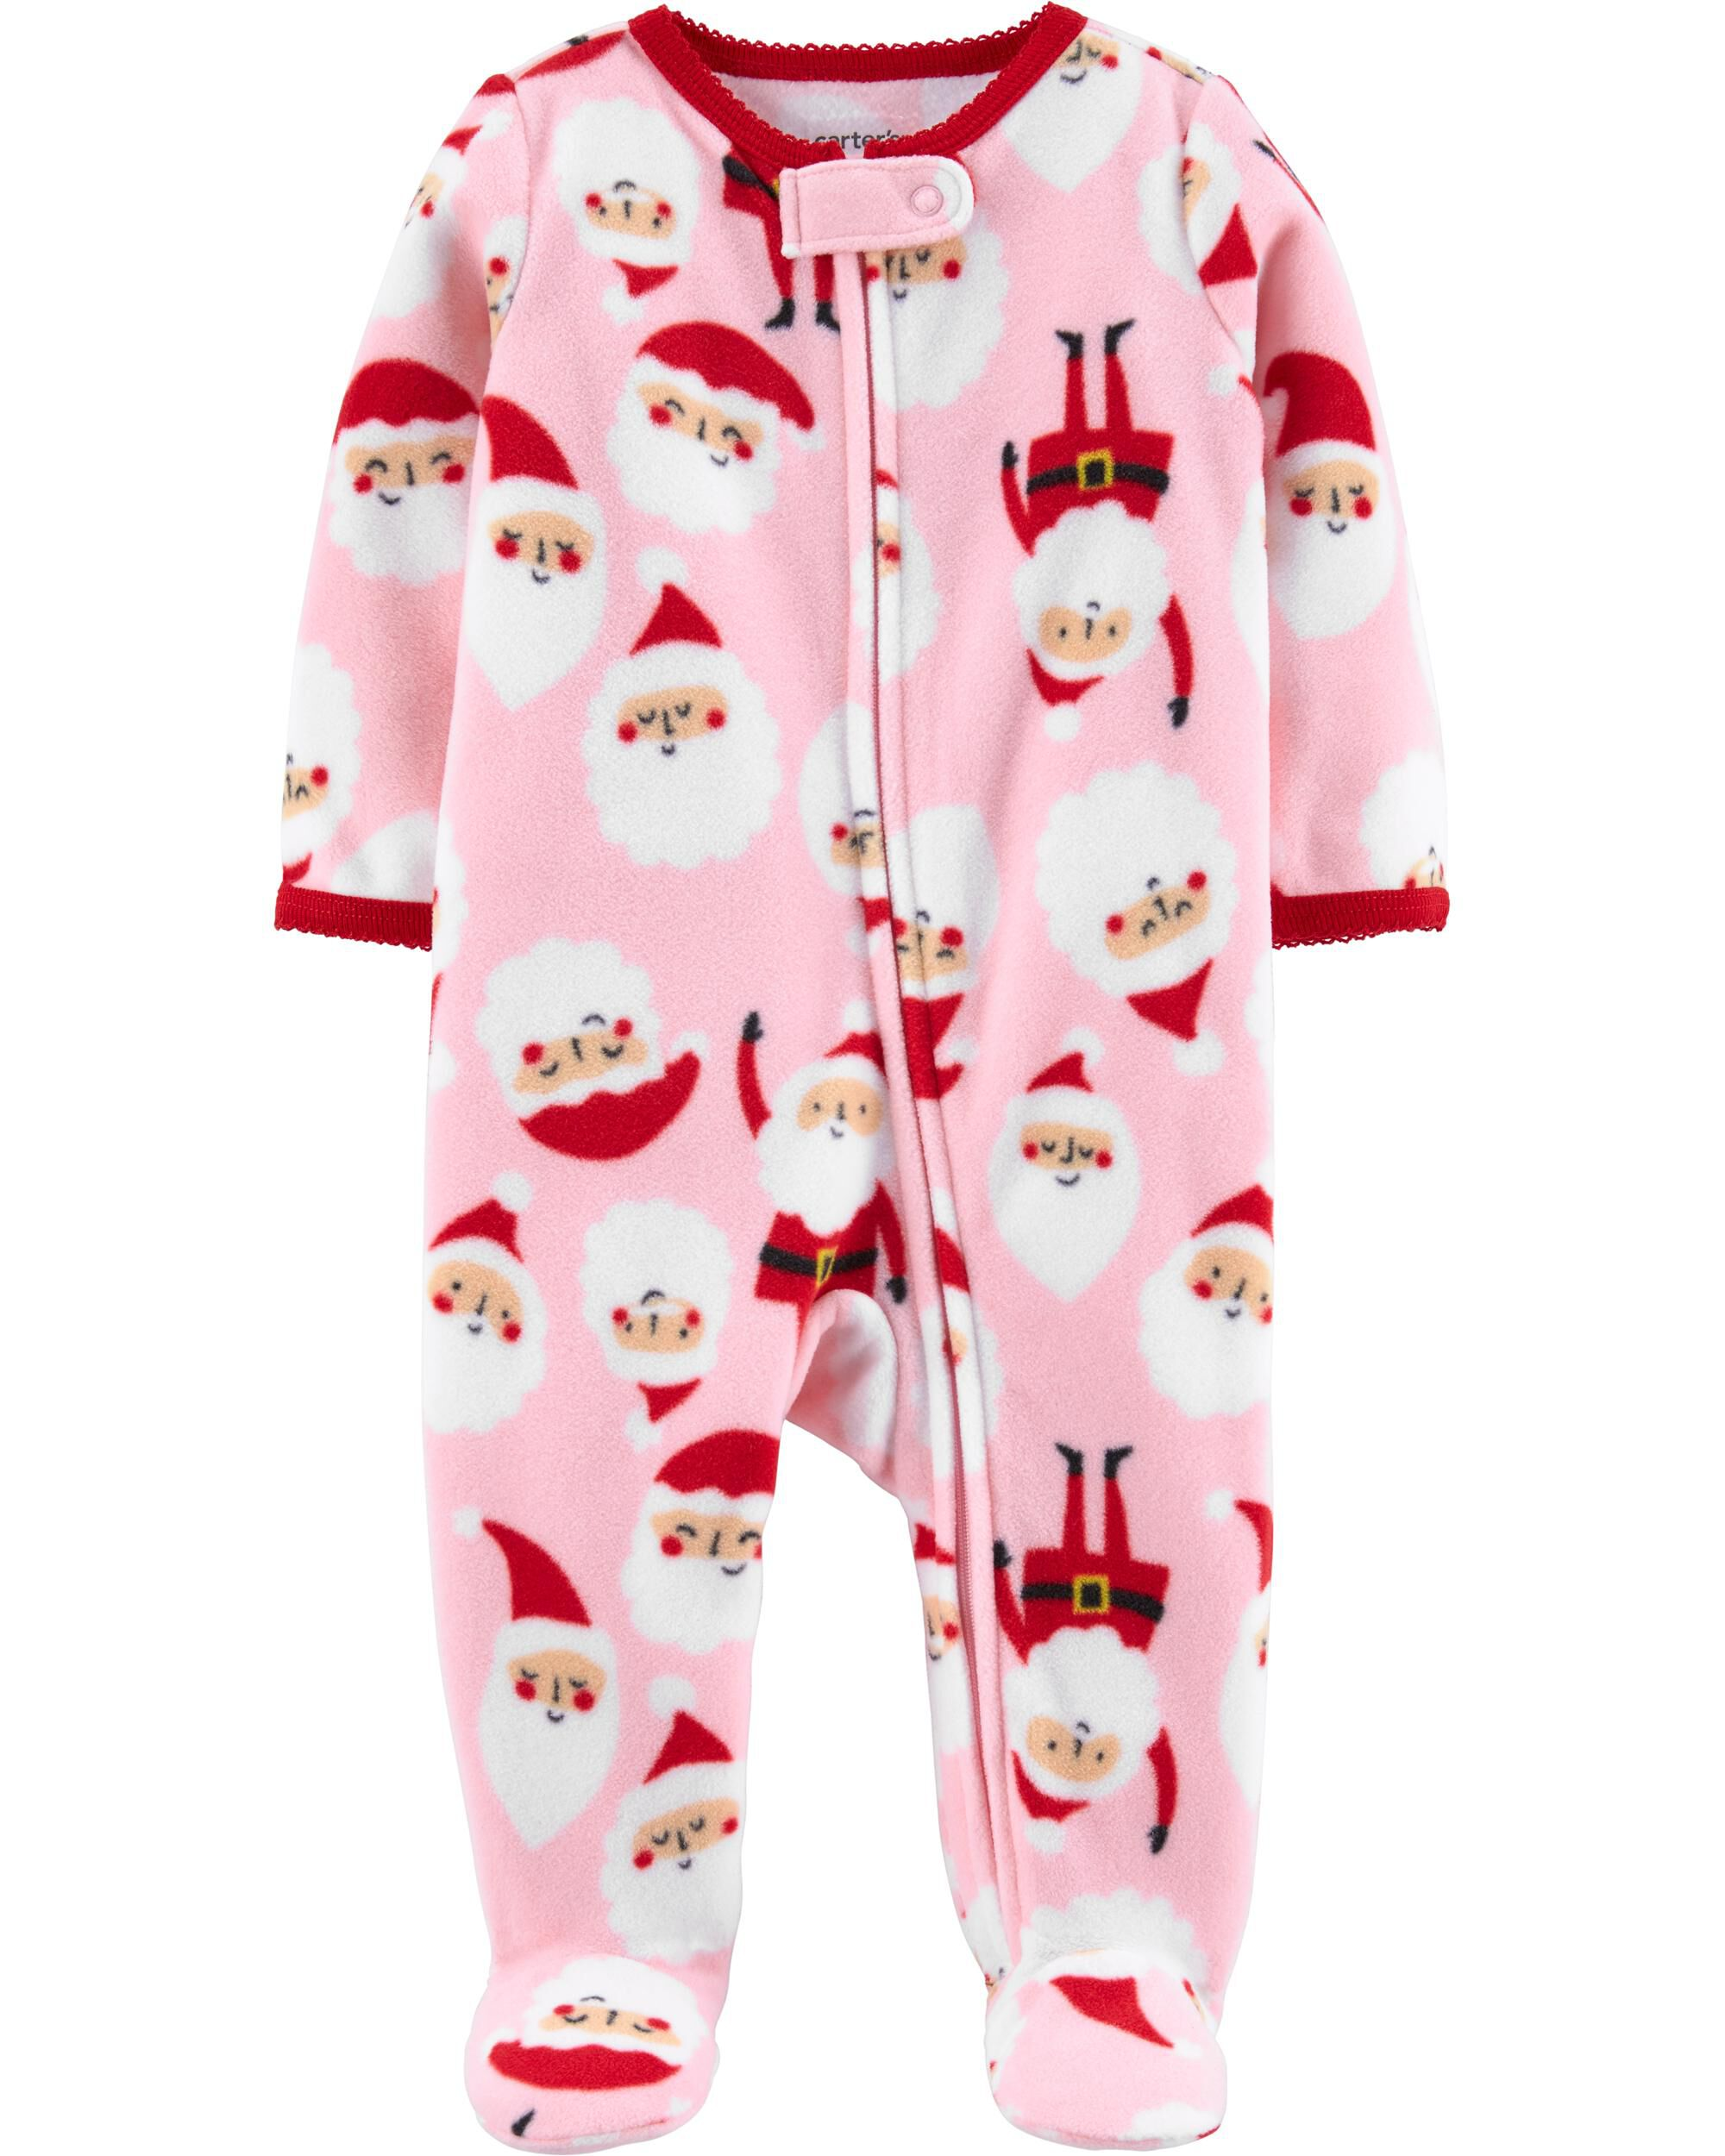 Carter/'s Baby Girl Bodysuit Grandma/'s little Valentine Sleep or Play New